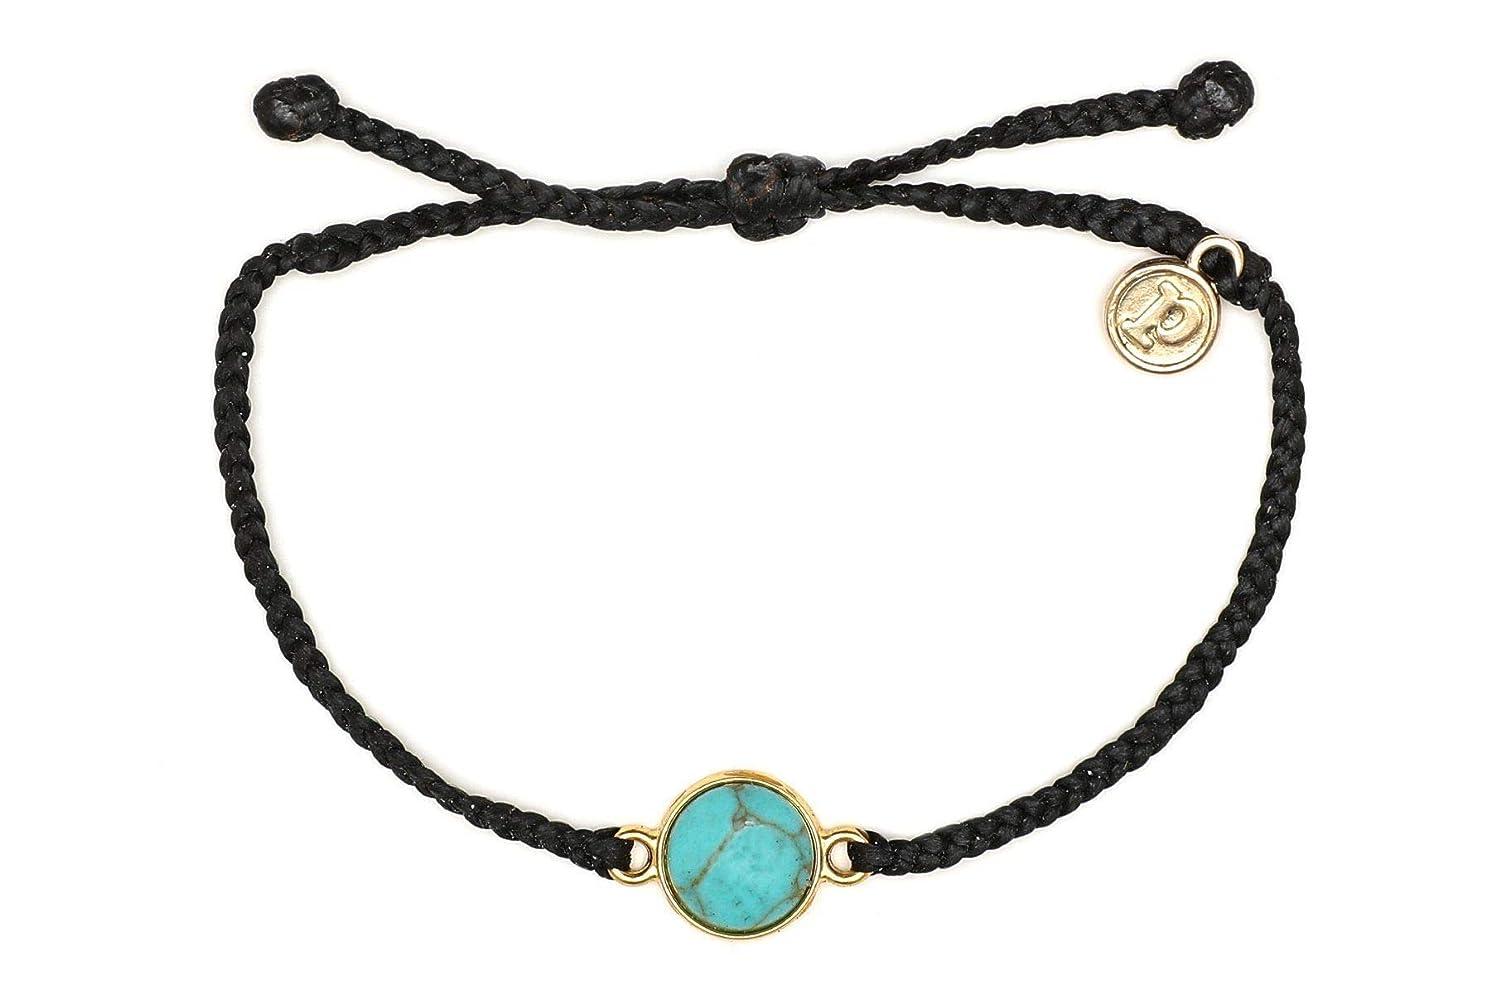 Pura Vida Rose Gold/Gold Riviera Stone Bezel Braided Bracelet Plated Charm Adjustable Band Waterproof